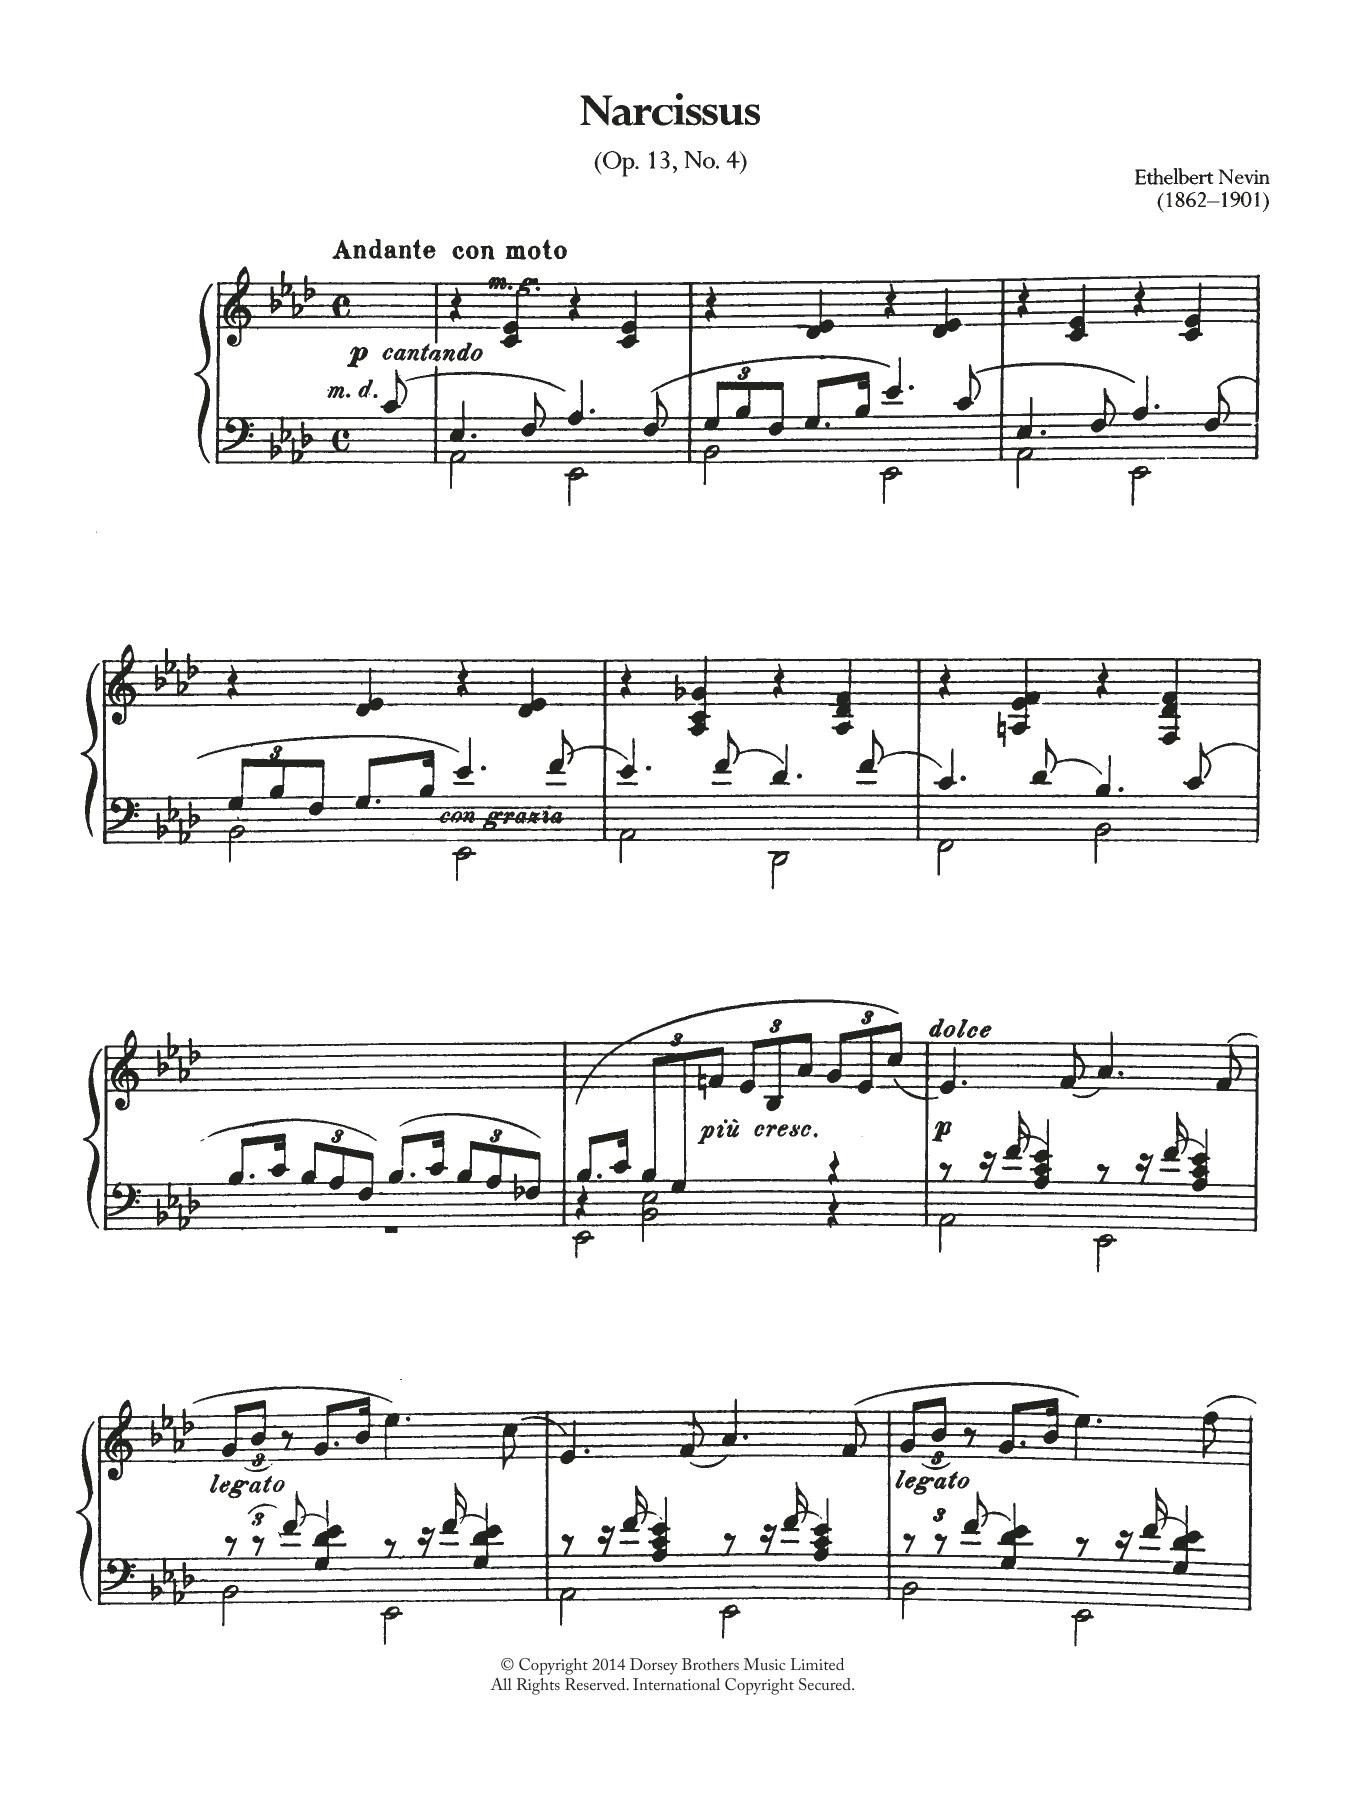 Ethelbert Nevin - Narcissus (Opus 13 No.4)